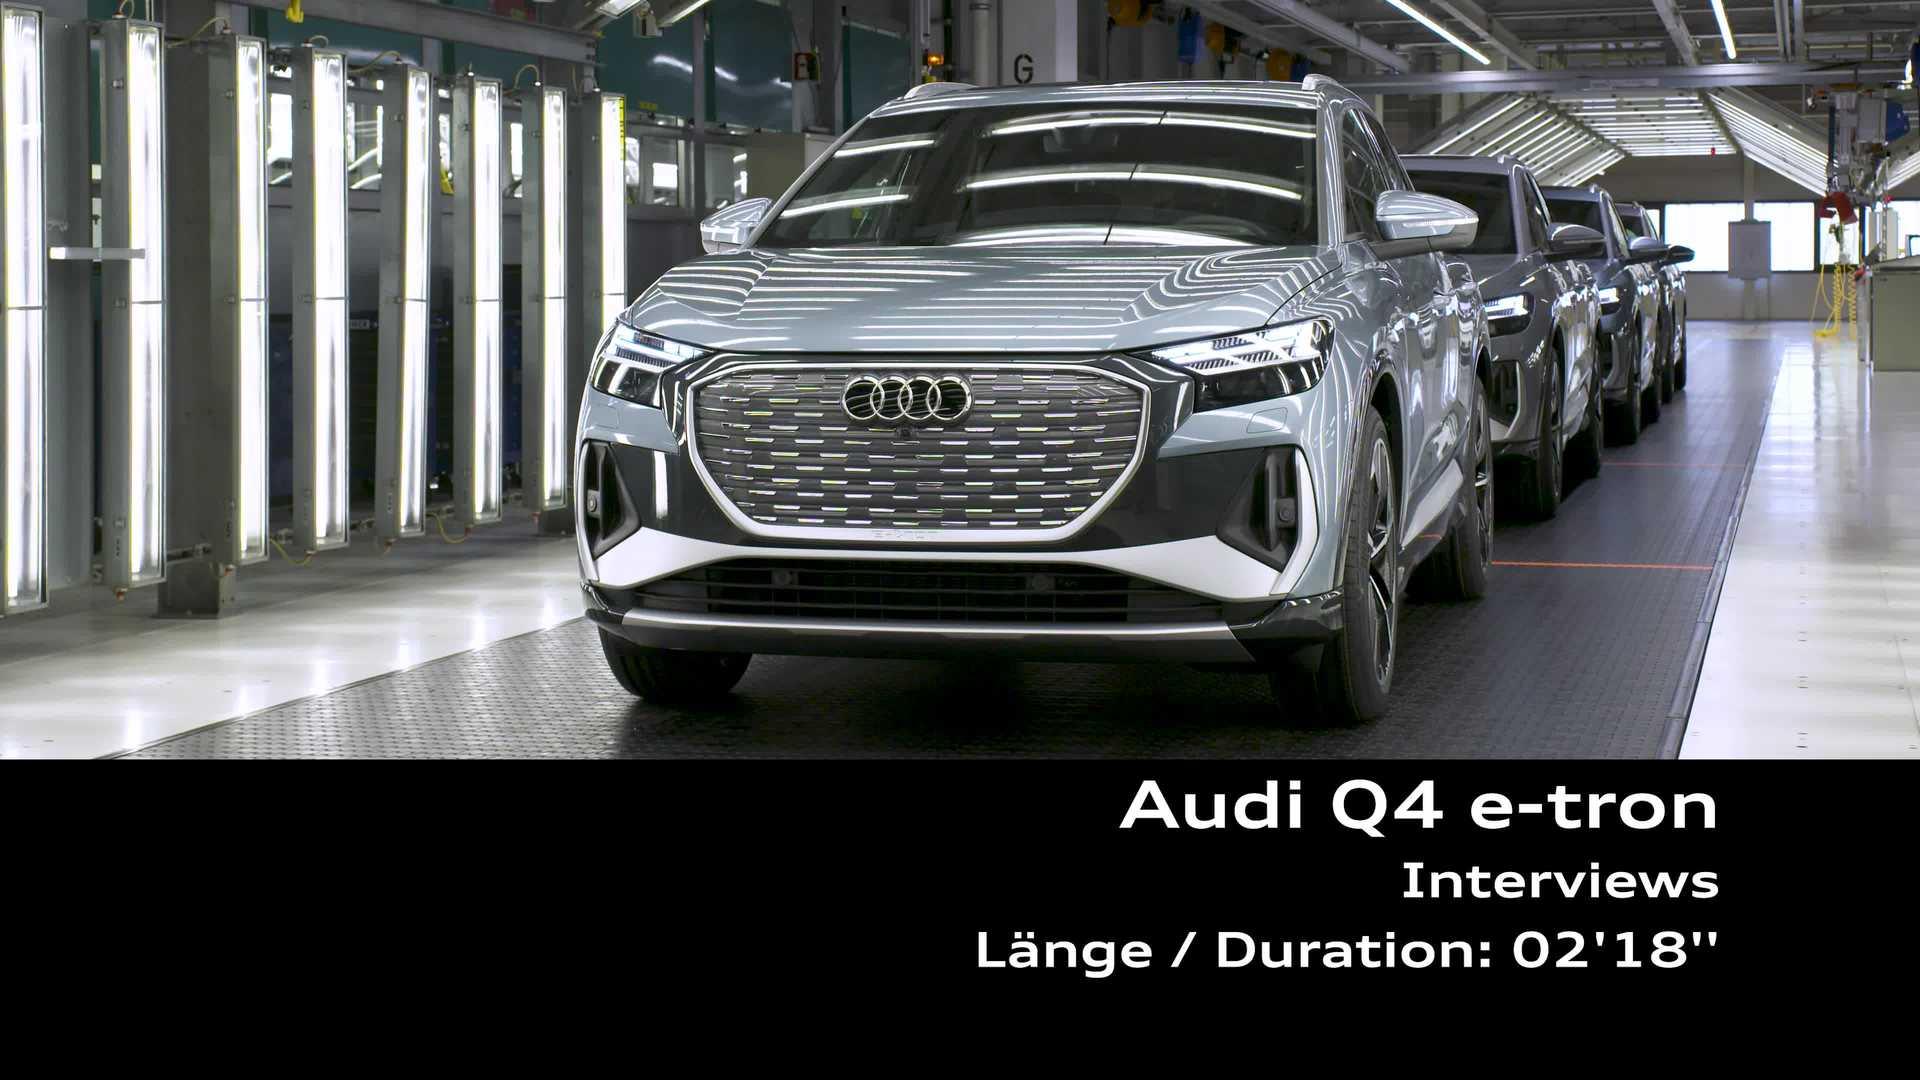 Footage: Audi Q4 e-tron - Interviews Peter Kössler, Thomas Haimerl, Dirk Greifeld